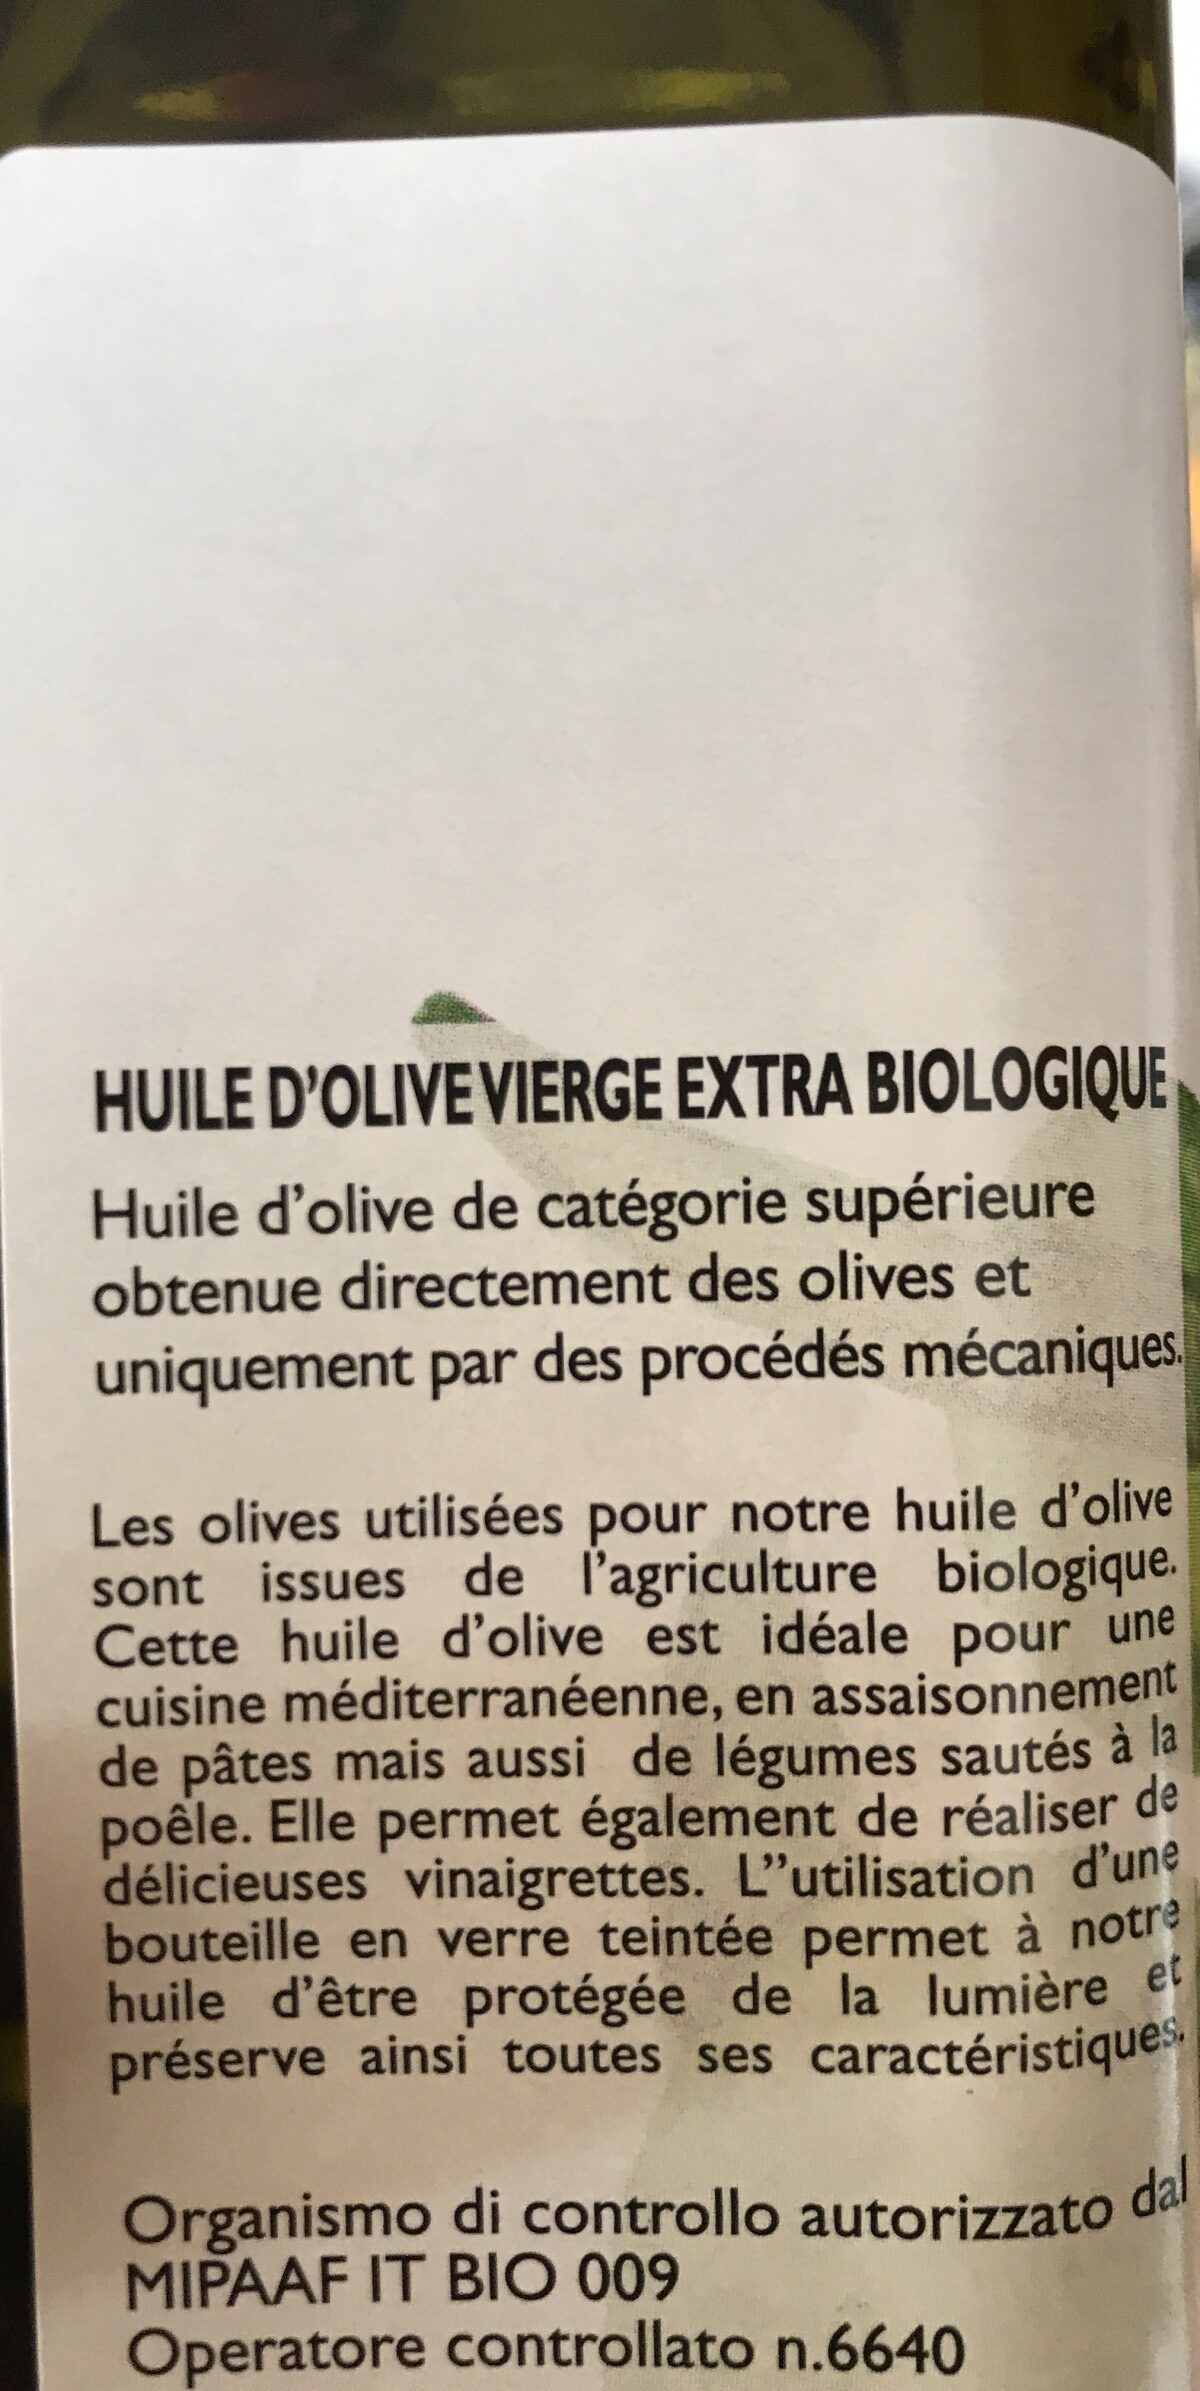 Huile d'olive vierge extra 100% Tunisie - Ingrédients